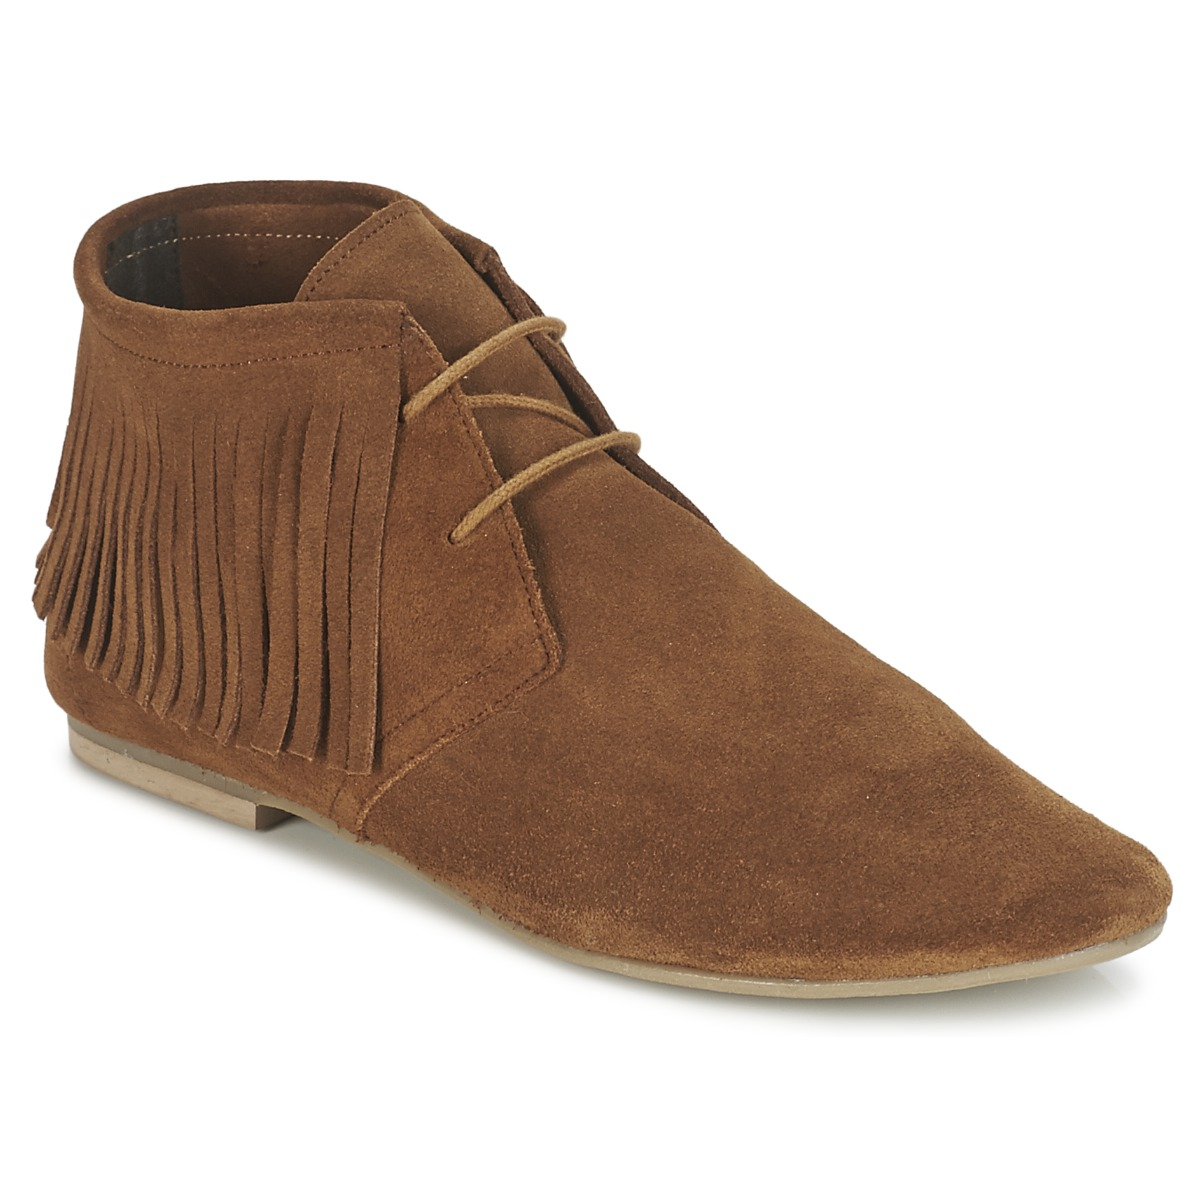 Betty London ELODALE Braun - Kostenloser Versand bei Spartoode ! - Schuhe Boots Damen 44,99 €